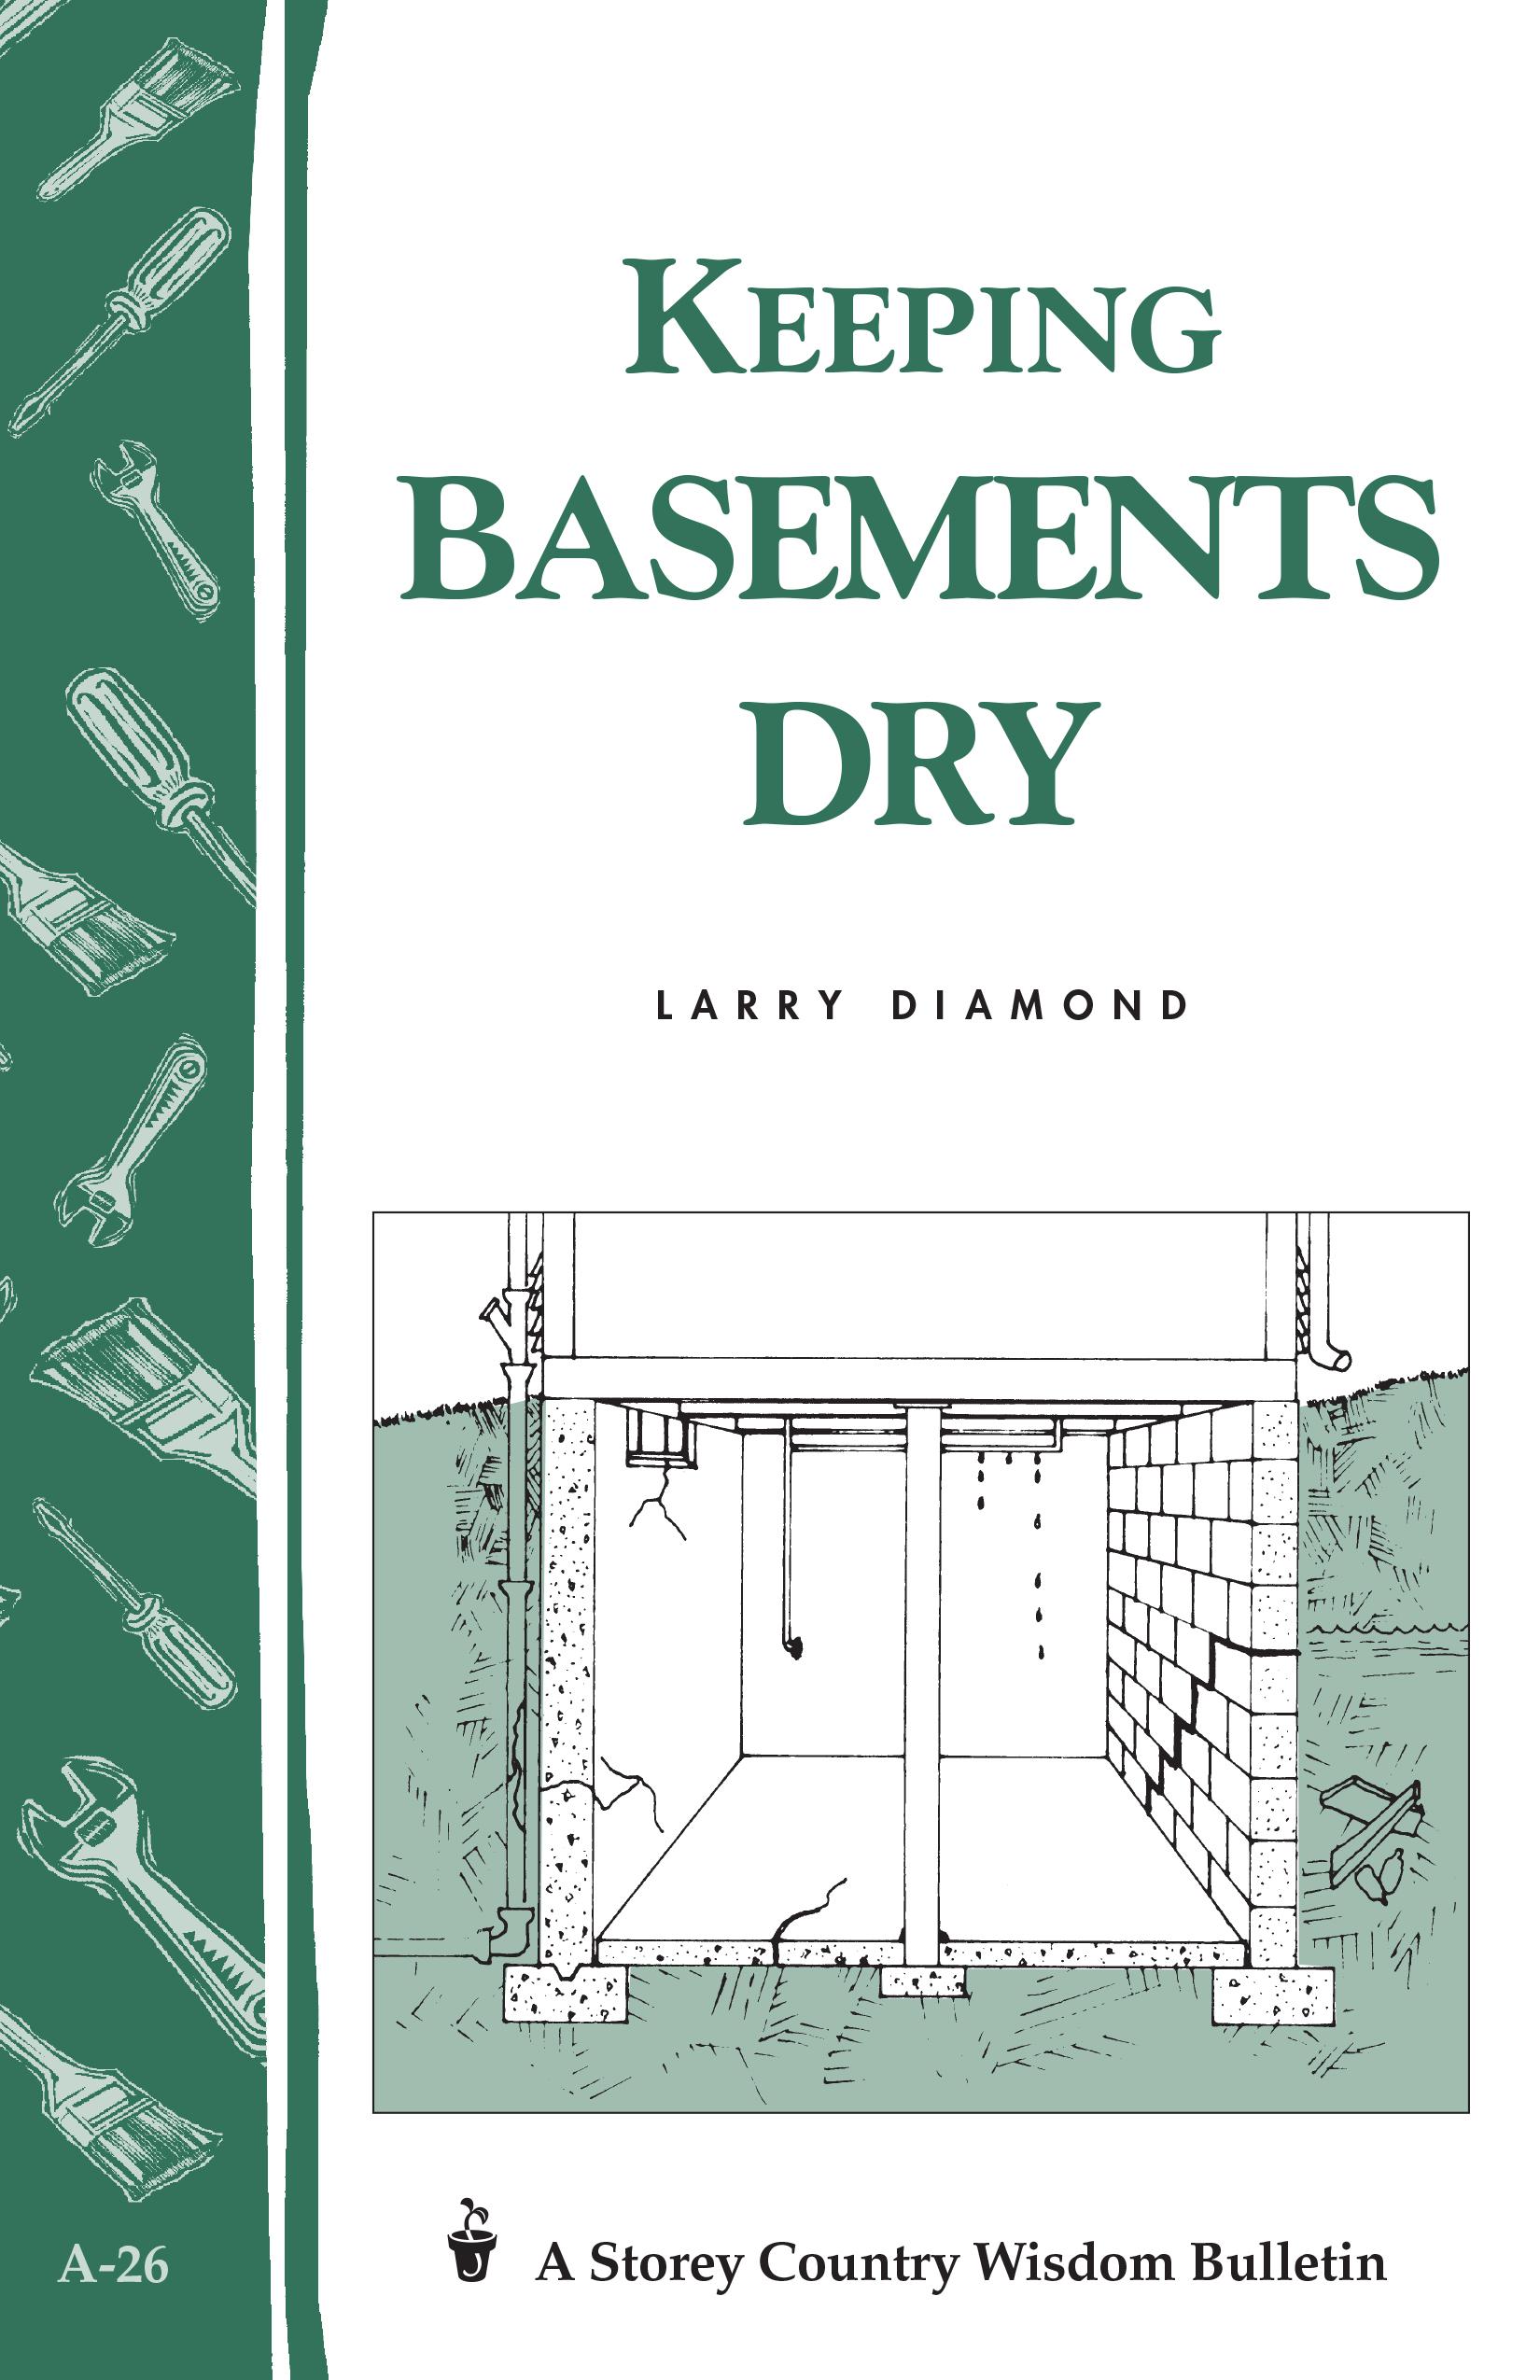 Keeping Basements Dry Storey's Country Wisdom Bulletin  A-26 - Larry Diamond